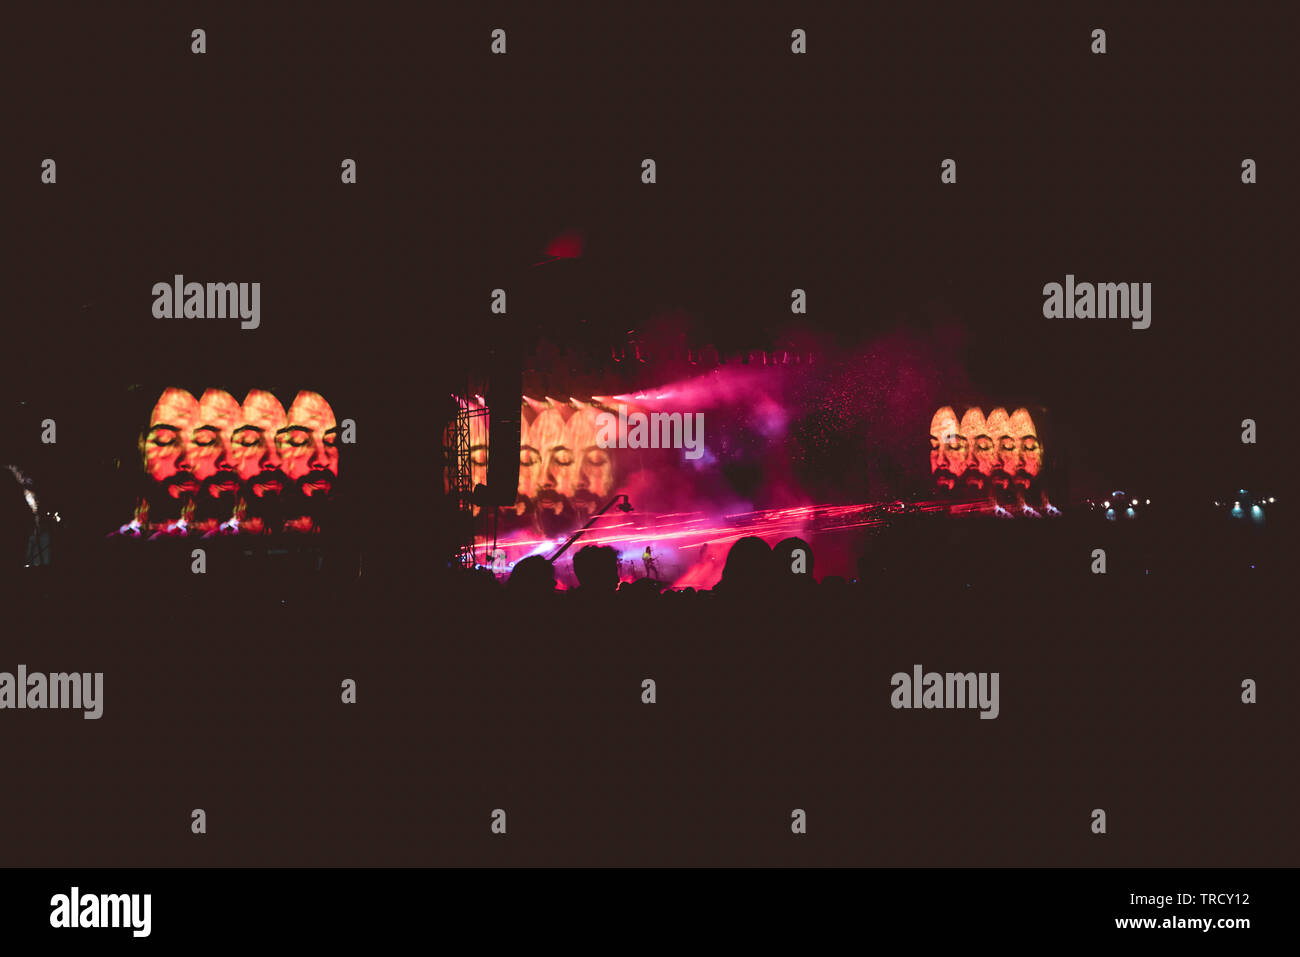 Tame Impala at Primavera Sound 2019 - Stock Image